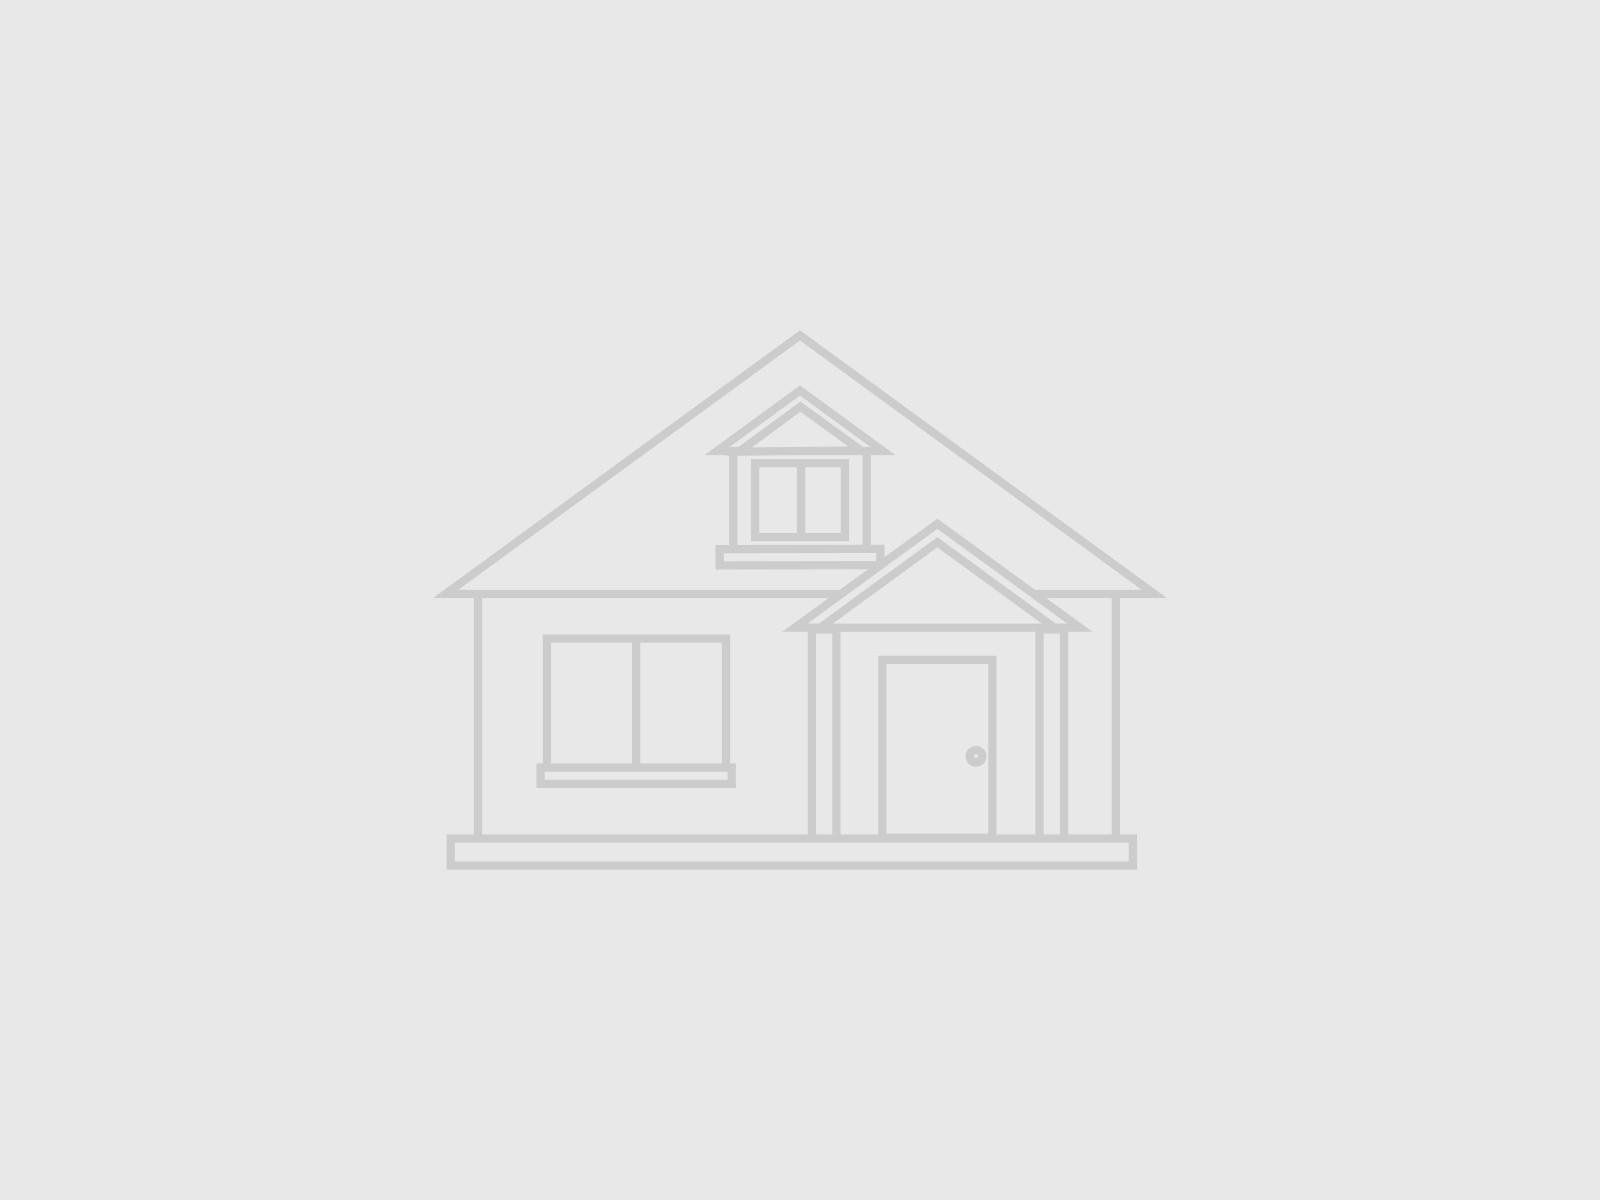 21701 e 26th avenue a luxury single family home for sale in aurora, colorado property id 1586372 christie s international real estate